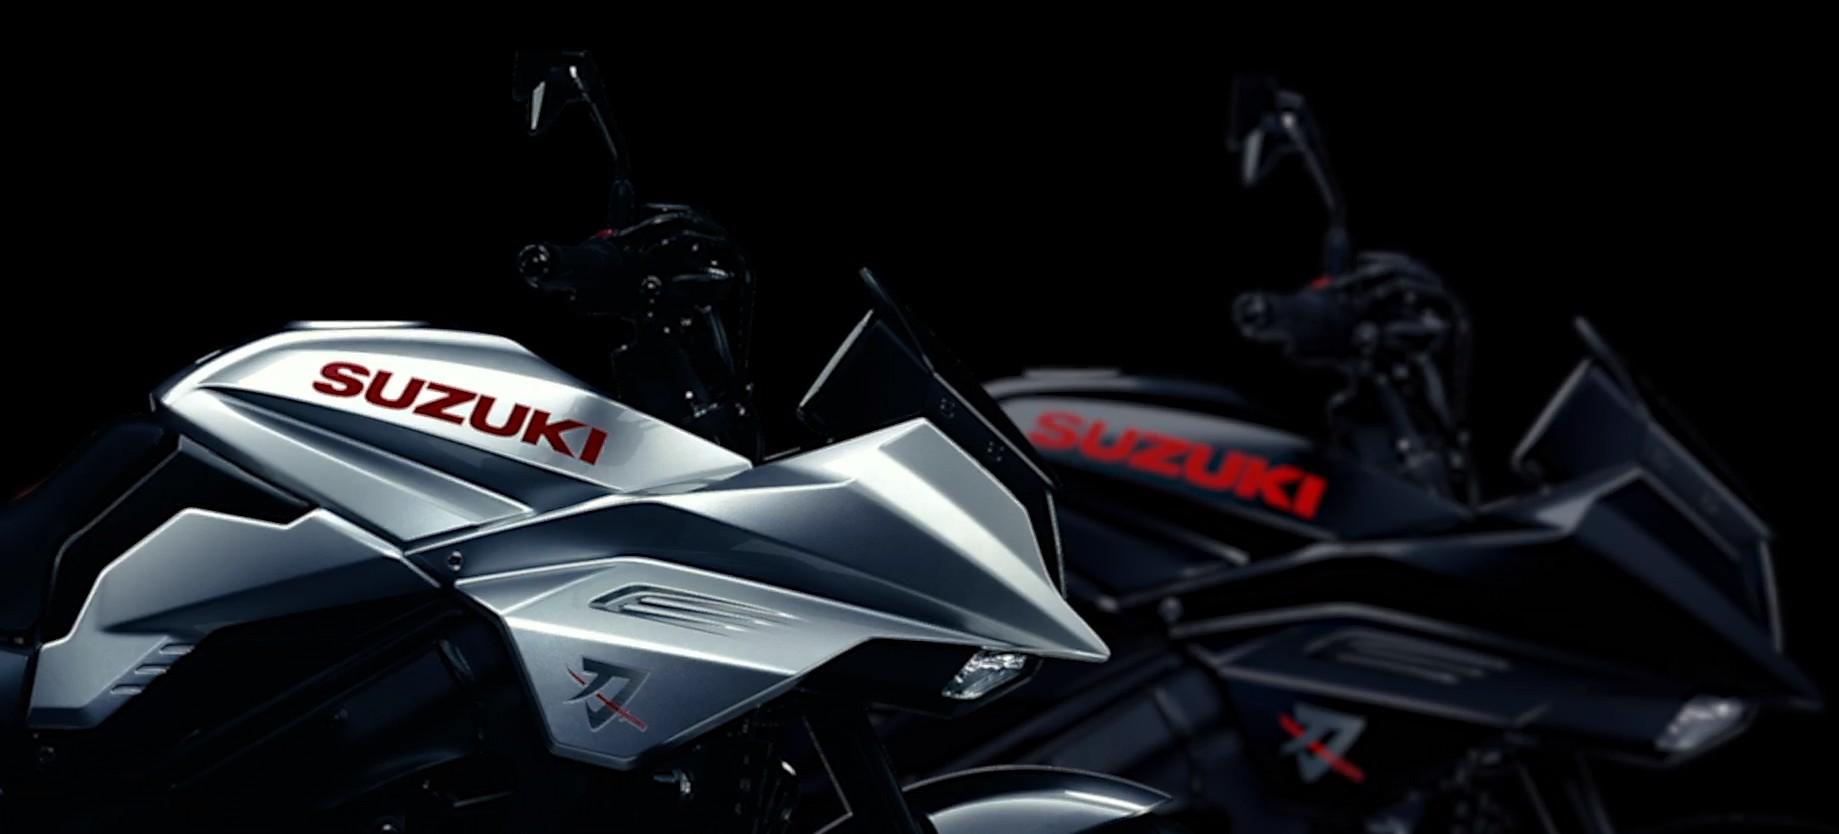 SUZUKI新型KATANA早くも新色登場!11月のミラノでブラックを公開予定